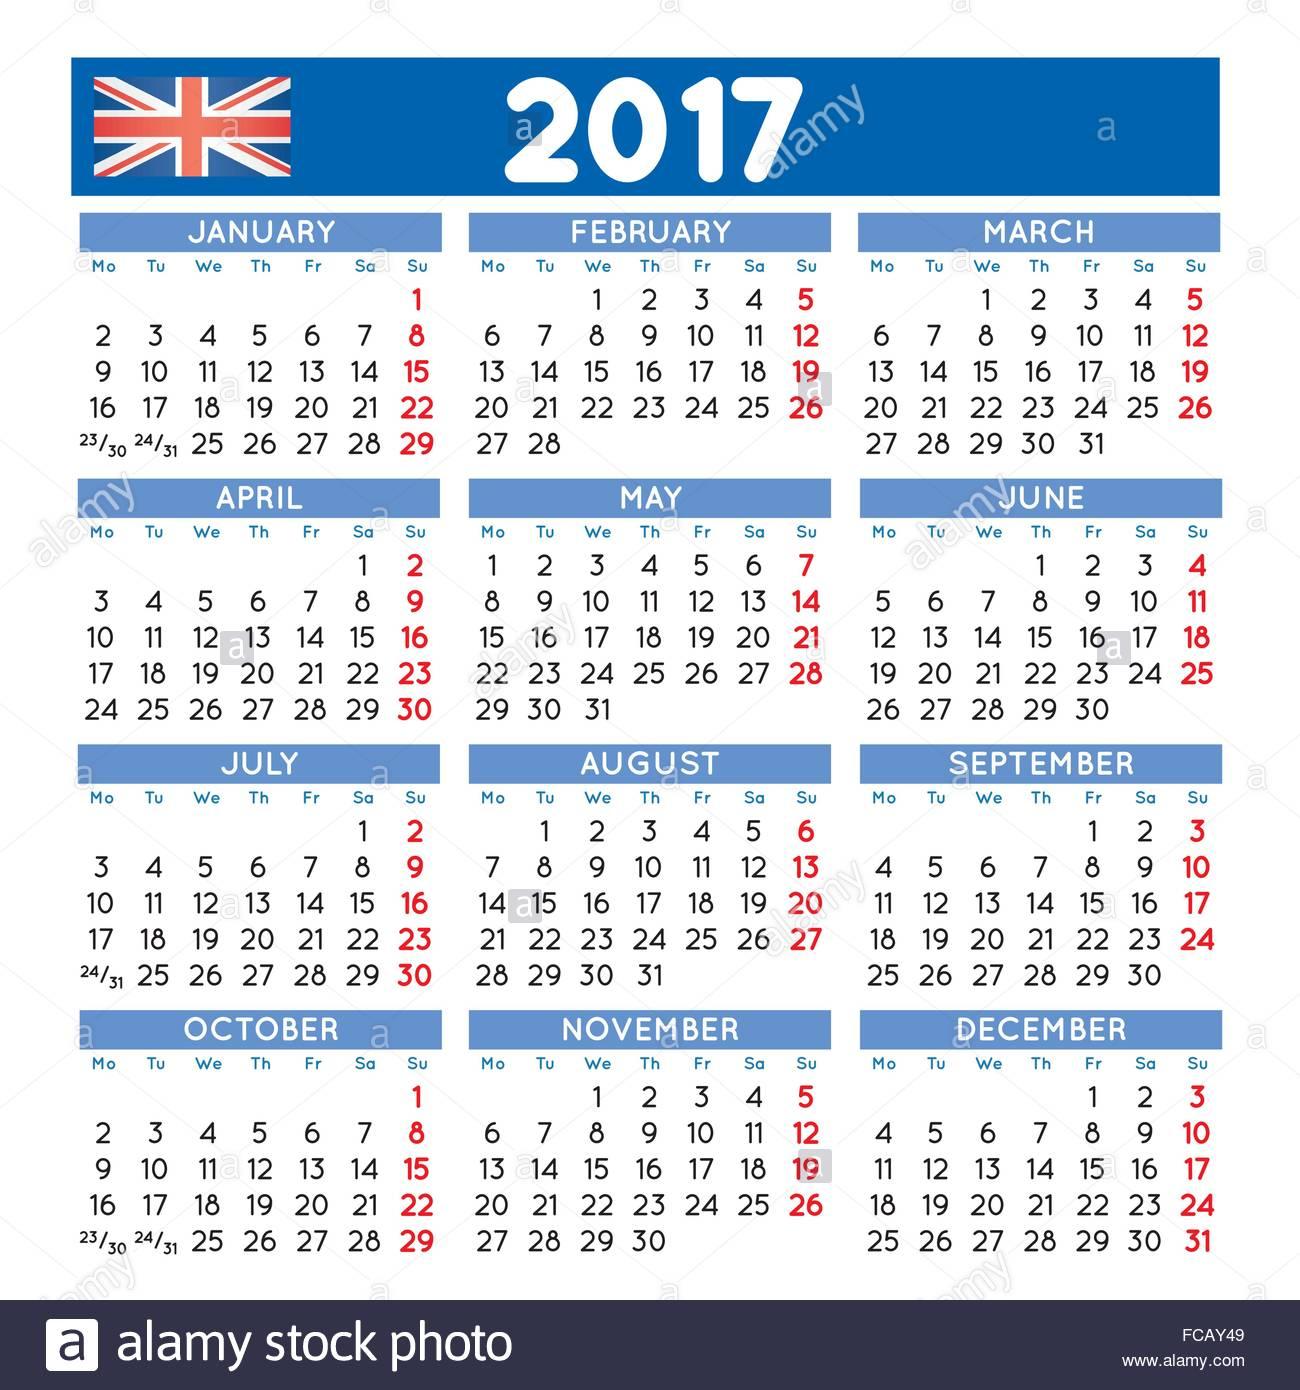 2017 Elegant Squared Calendar English Uk Year 2017